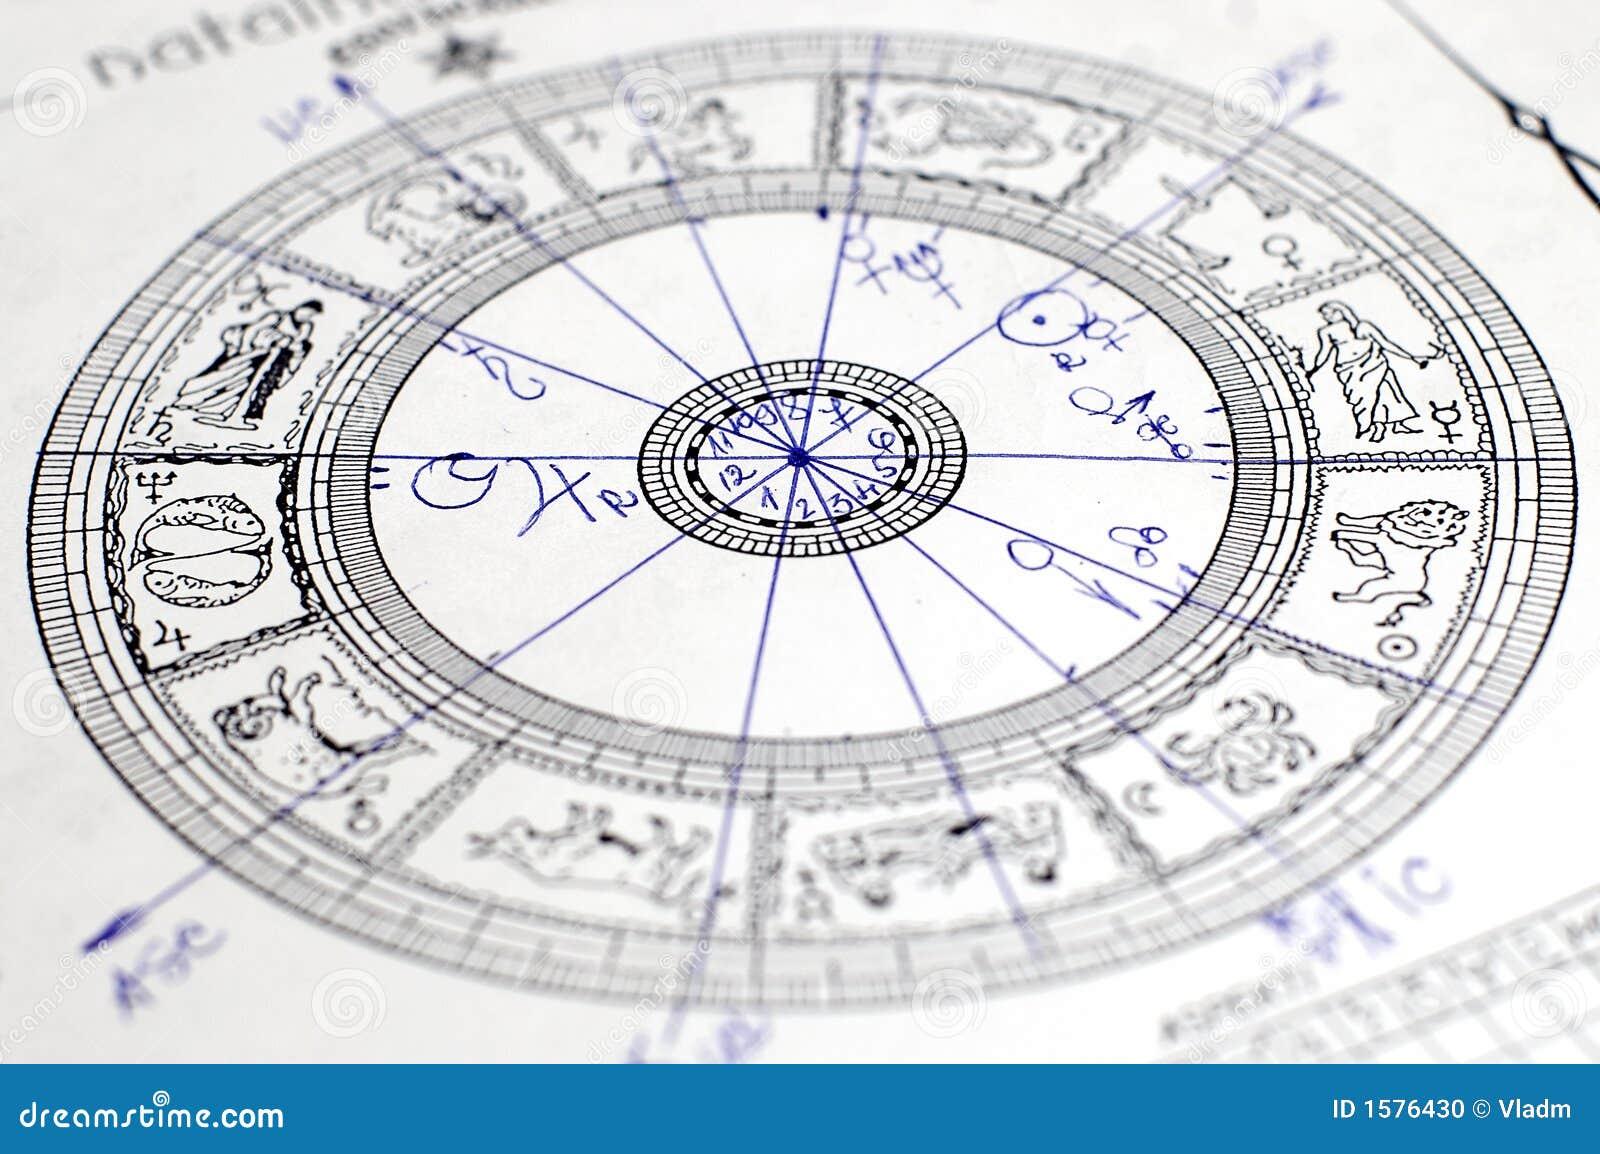 The wheel of zodiac stock photo image of calendar nativity 1576430 the wheel of zodiac calendar nativity nvjuhfo Gallery